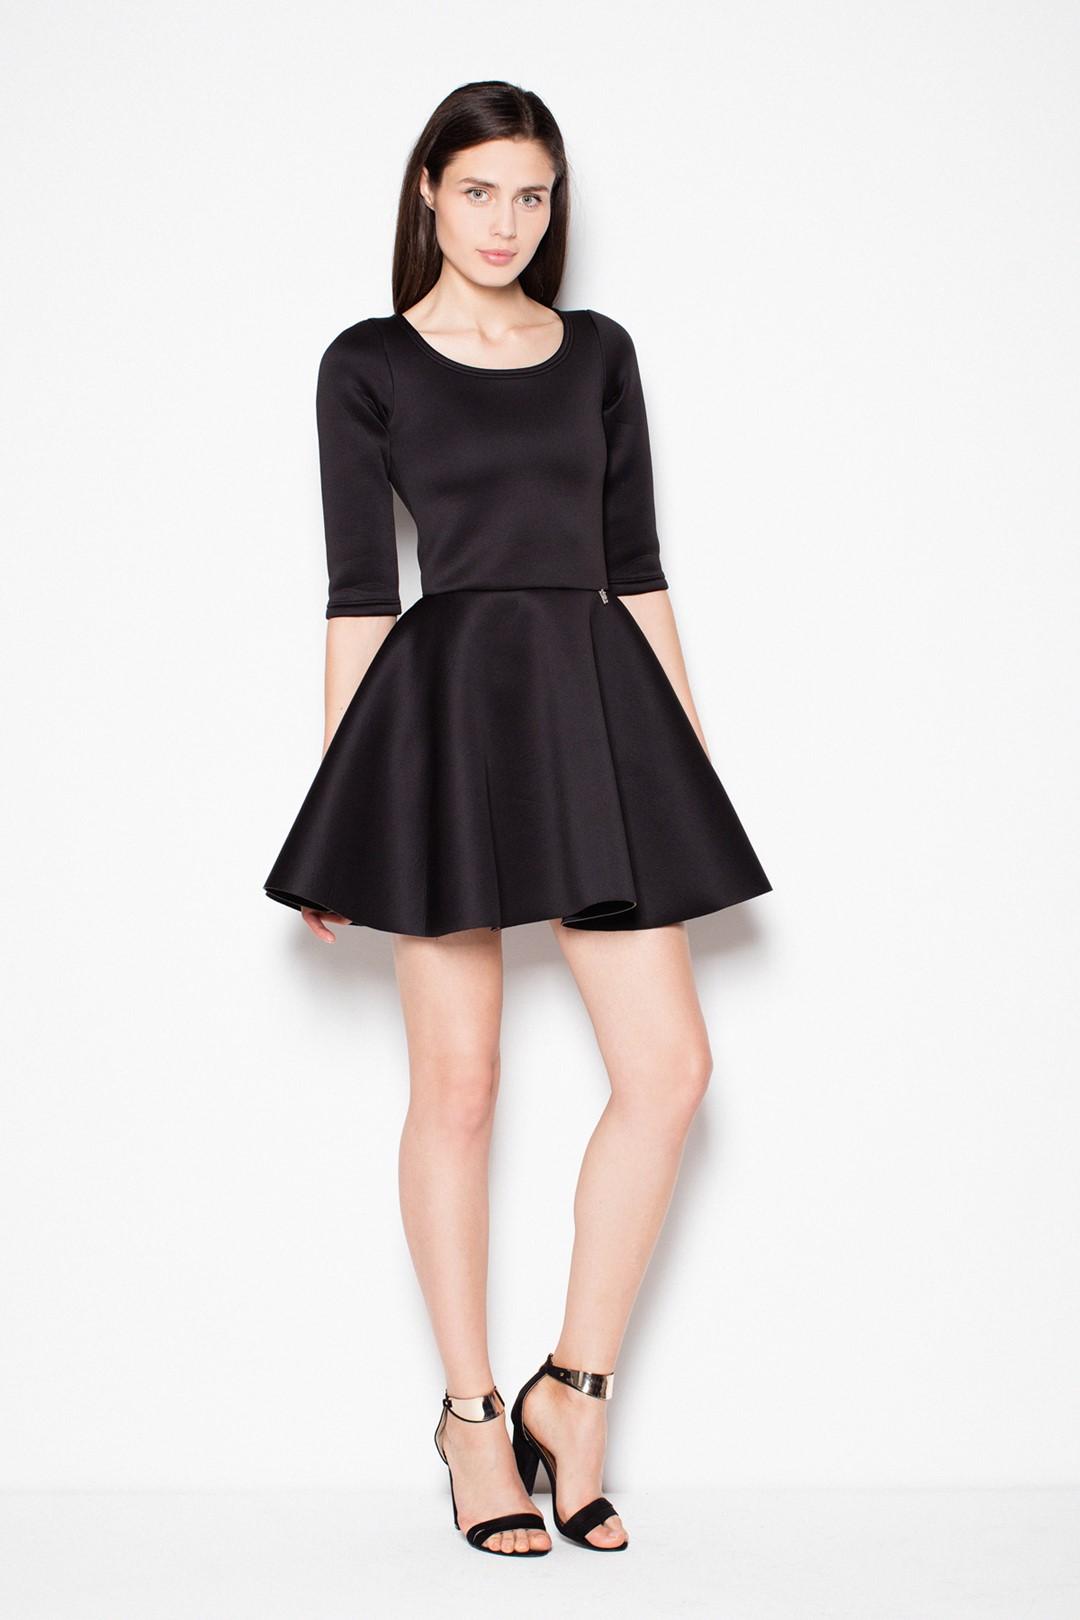 VENATON Černé mini šaty s 3 4 rukávy VT075 Black Velikost  L df4941b6adb